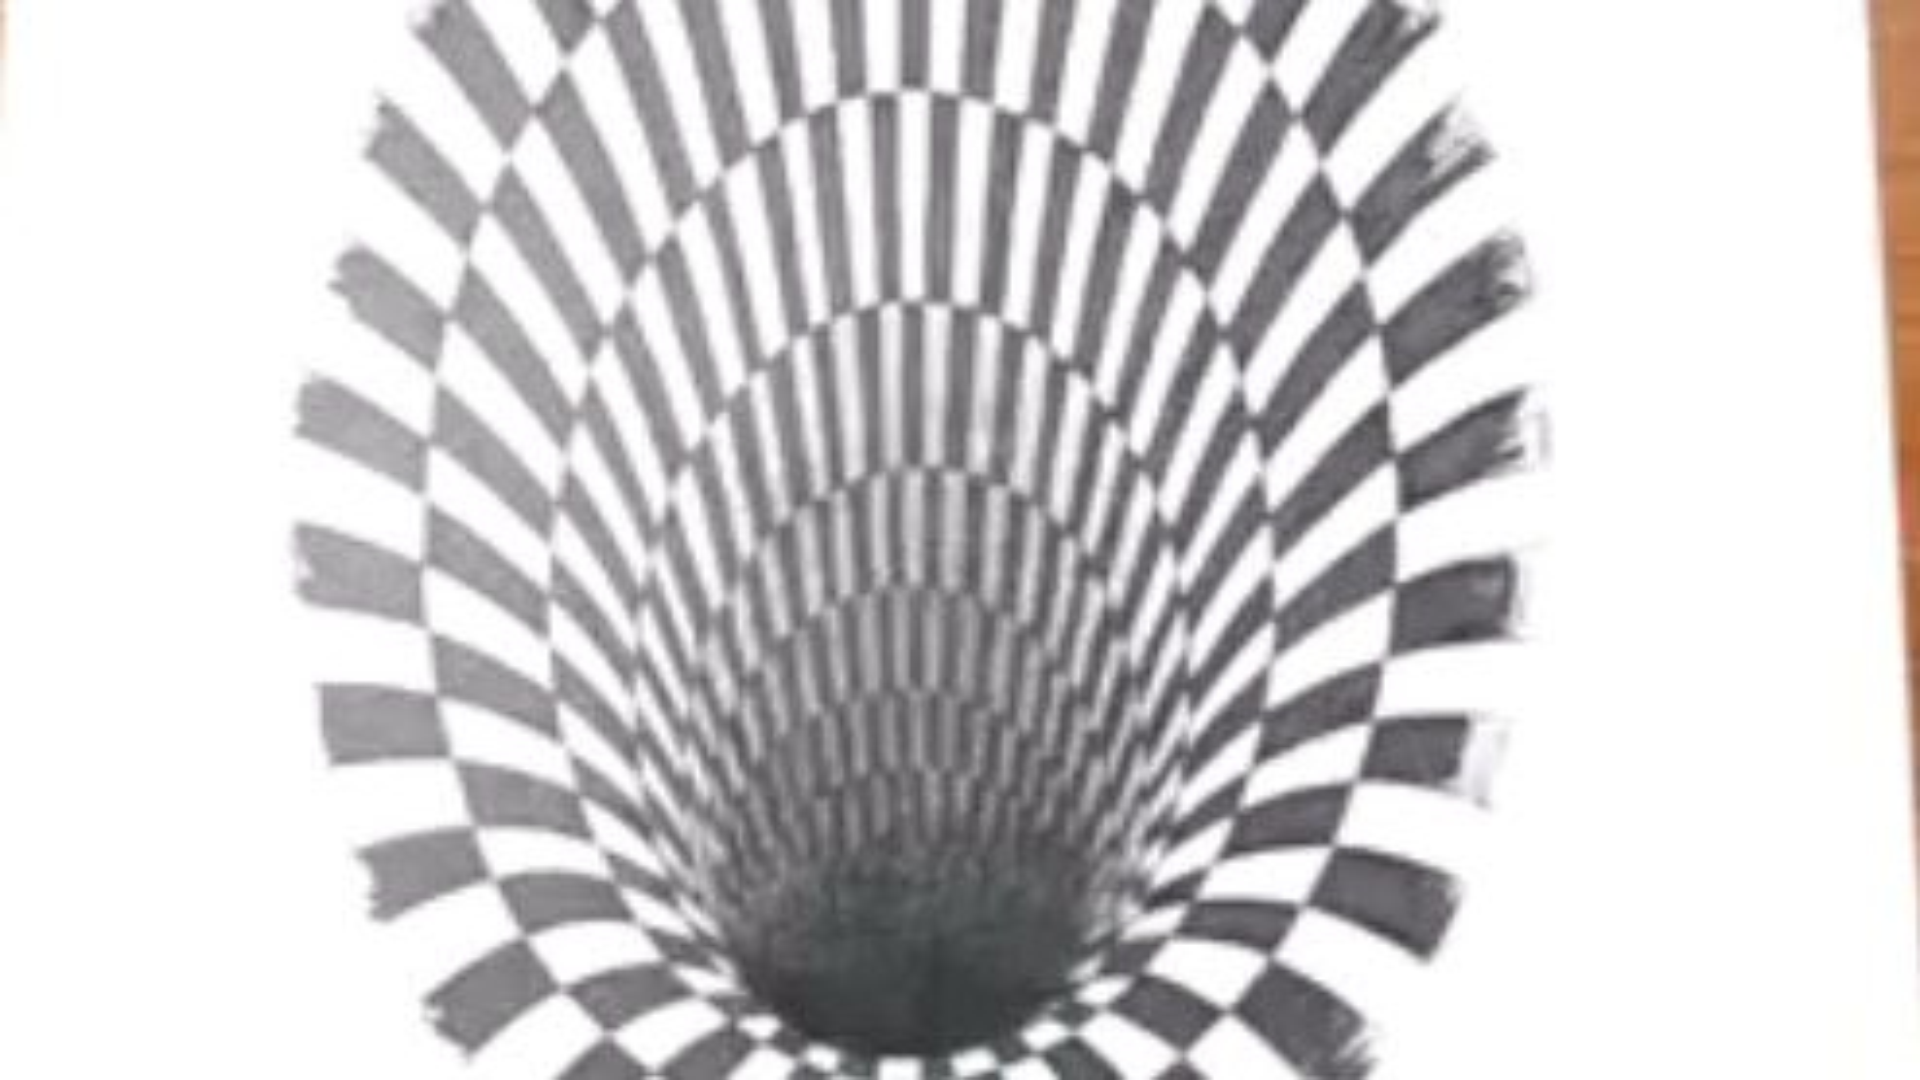 نقاشی سه بعدی گودال